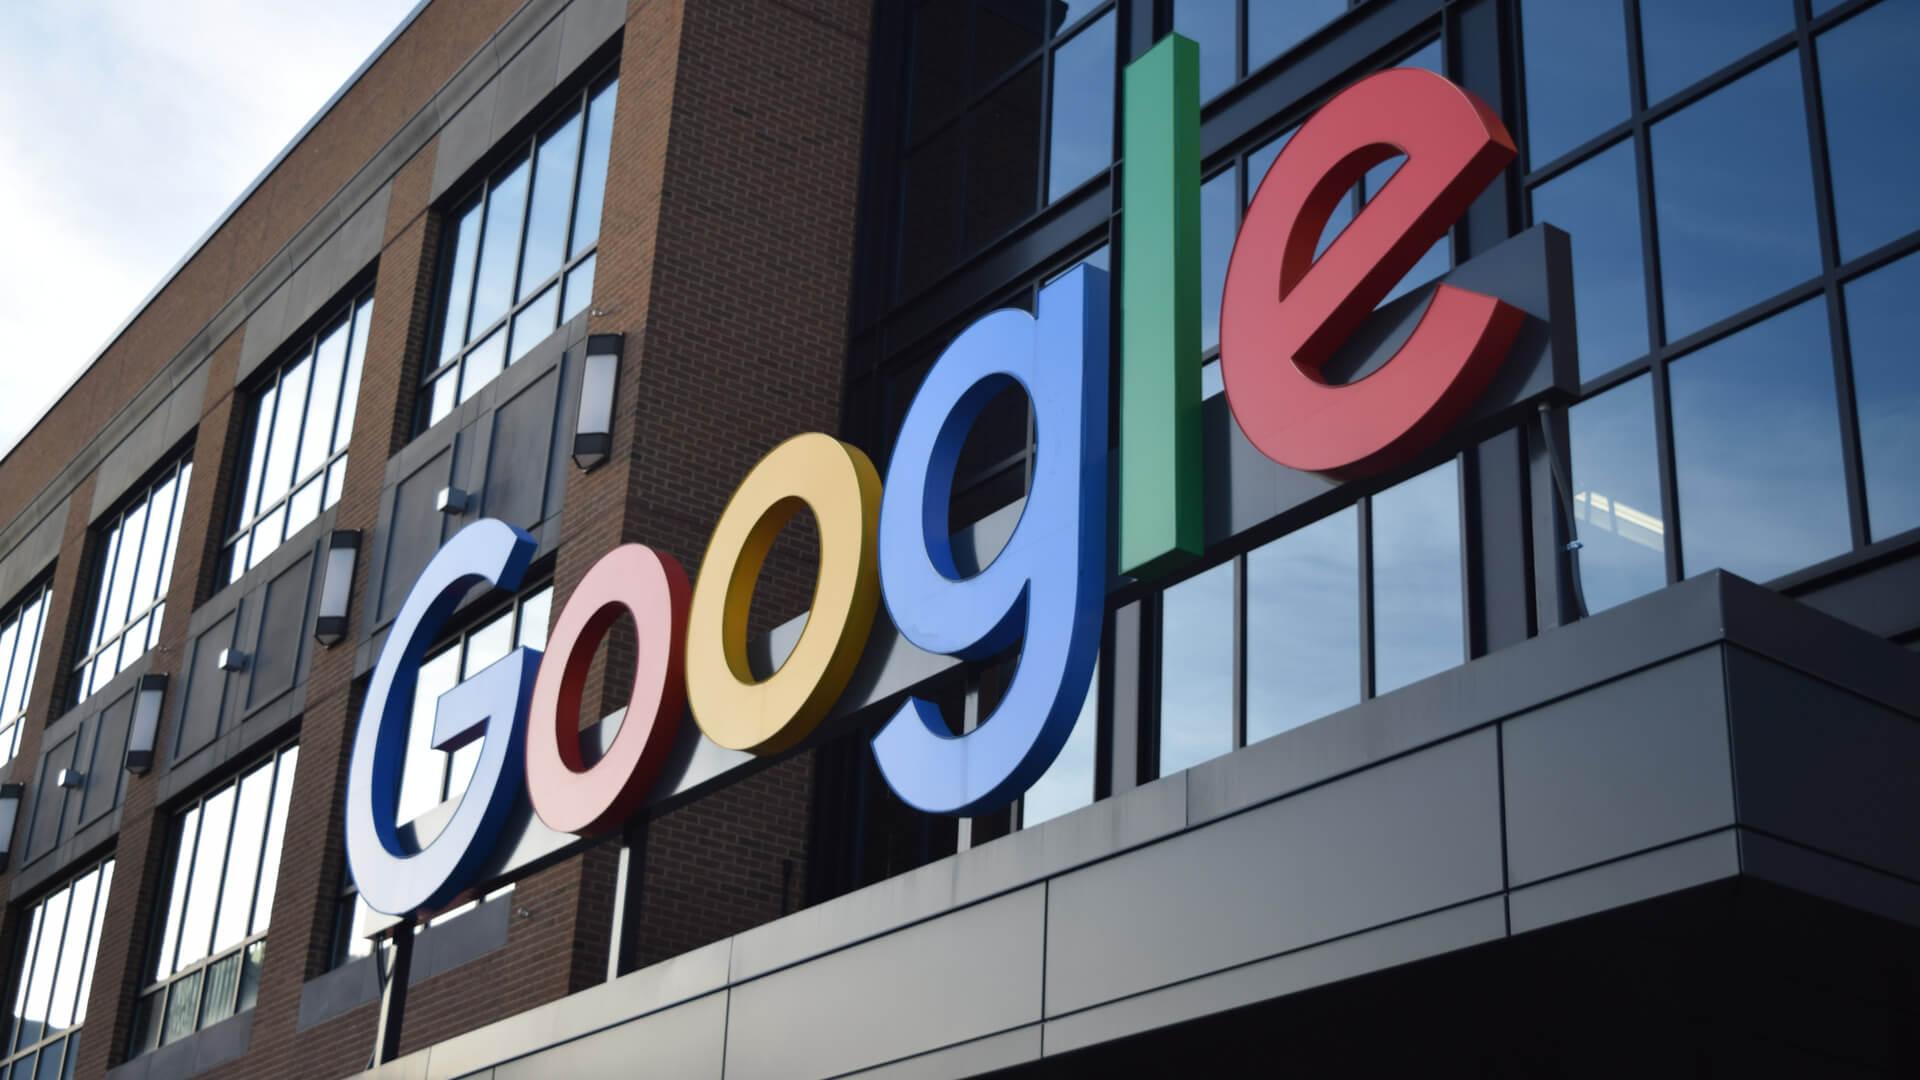 SEO - Google demotes libelous content in search through its predatory sites algorithms